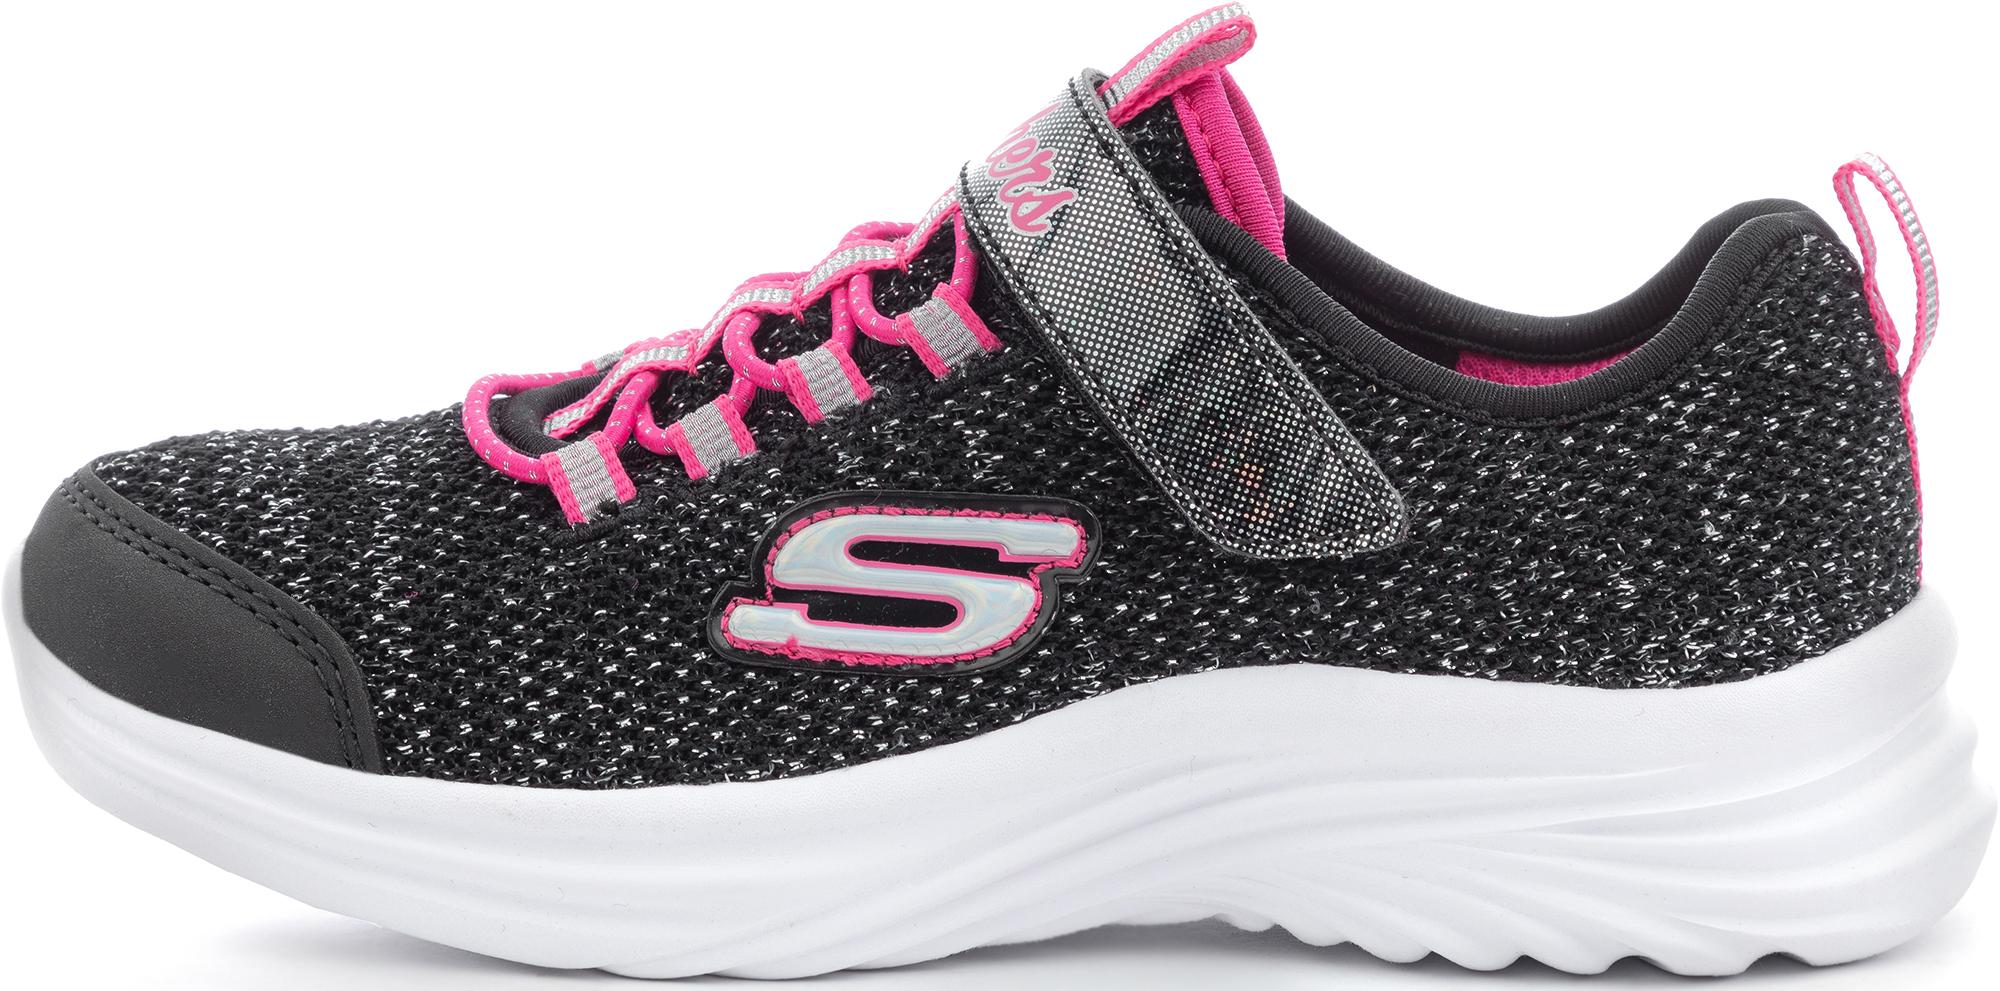 цена Skechers Полуботинки для девочек Skechers Dreamy Dancer, размер 37 онлайн в 2017 году